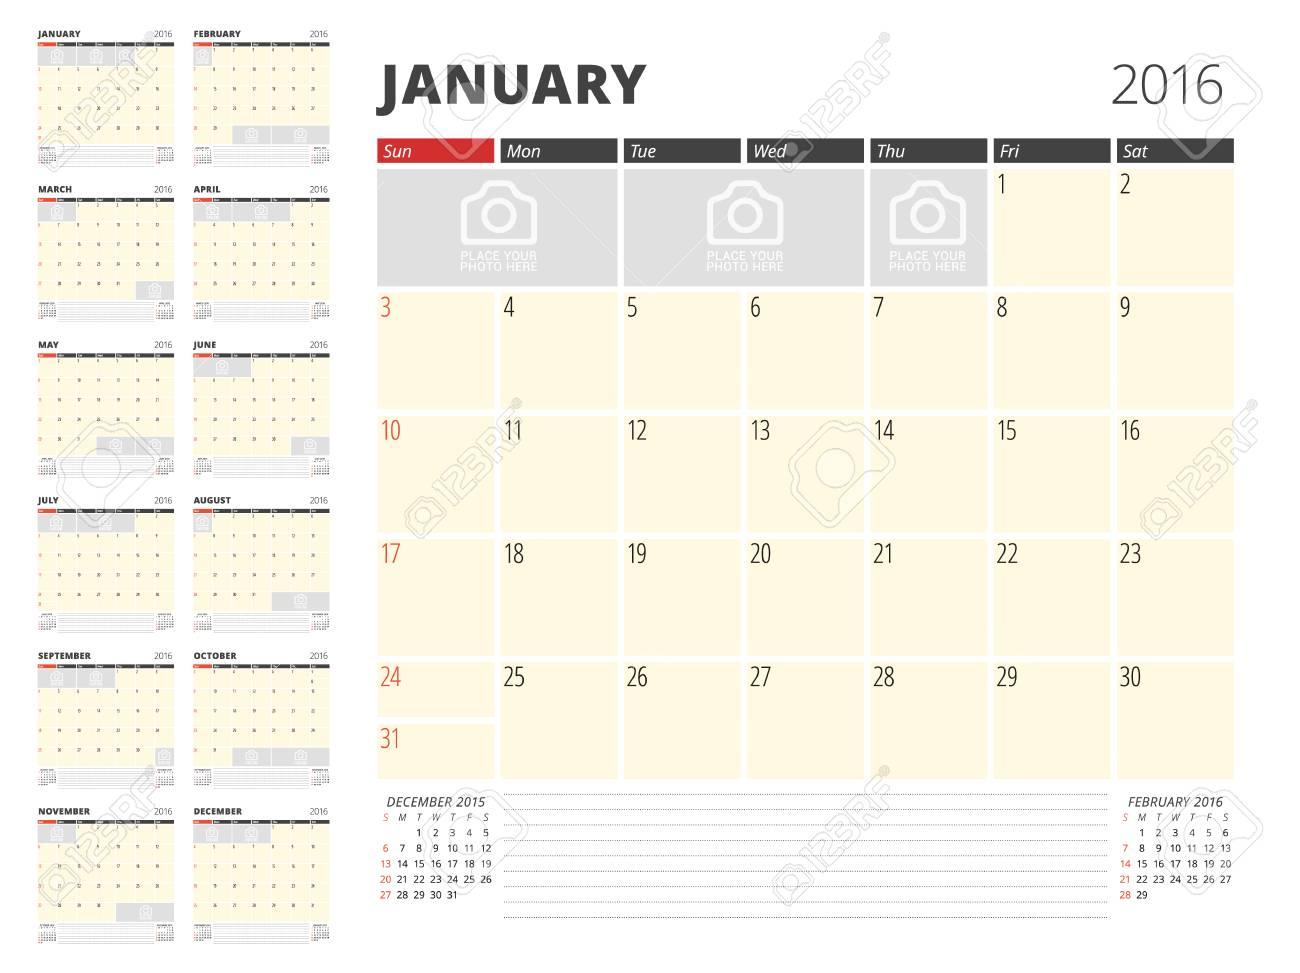 Fein Kalenderplaner Vorlage Excel Fotos - Entry Level Resume ...